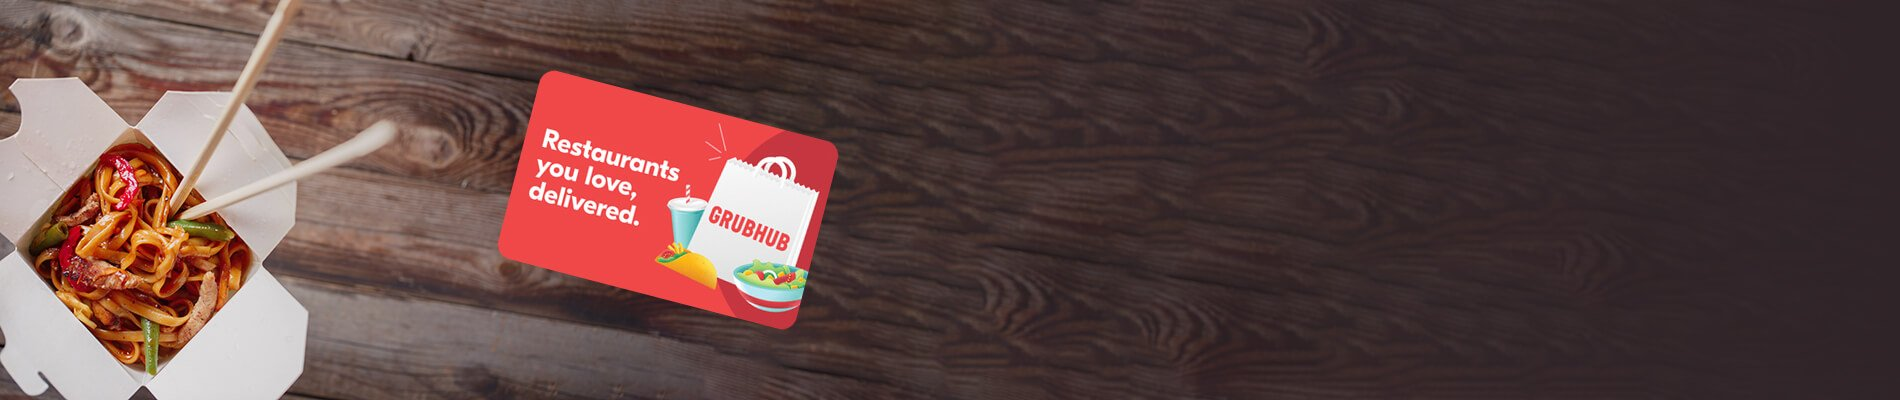 Grubhub eGift Card Sale